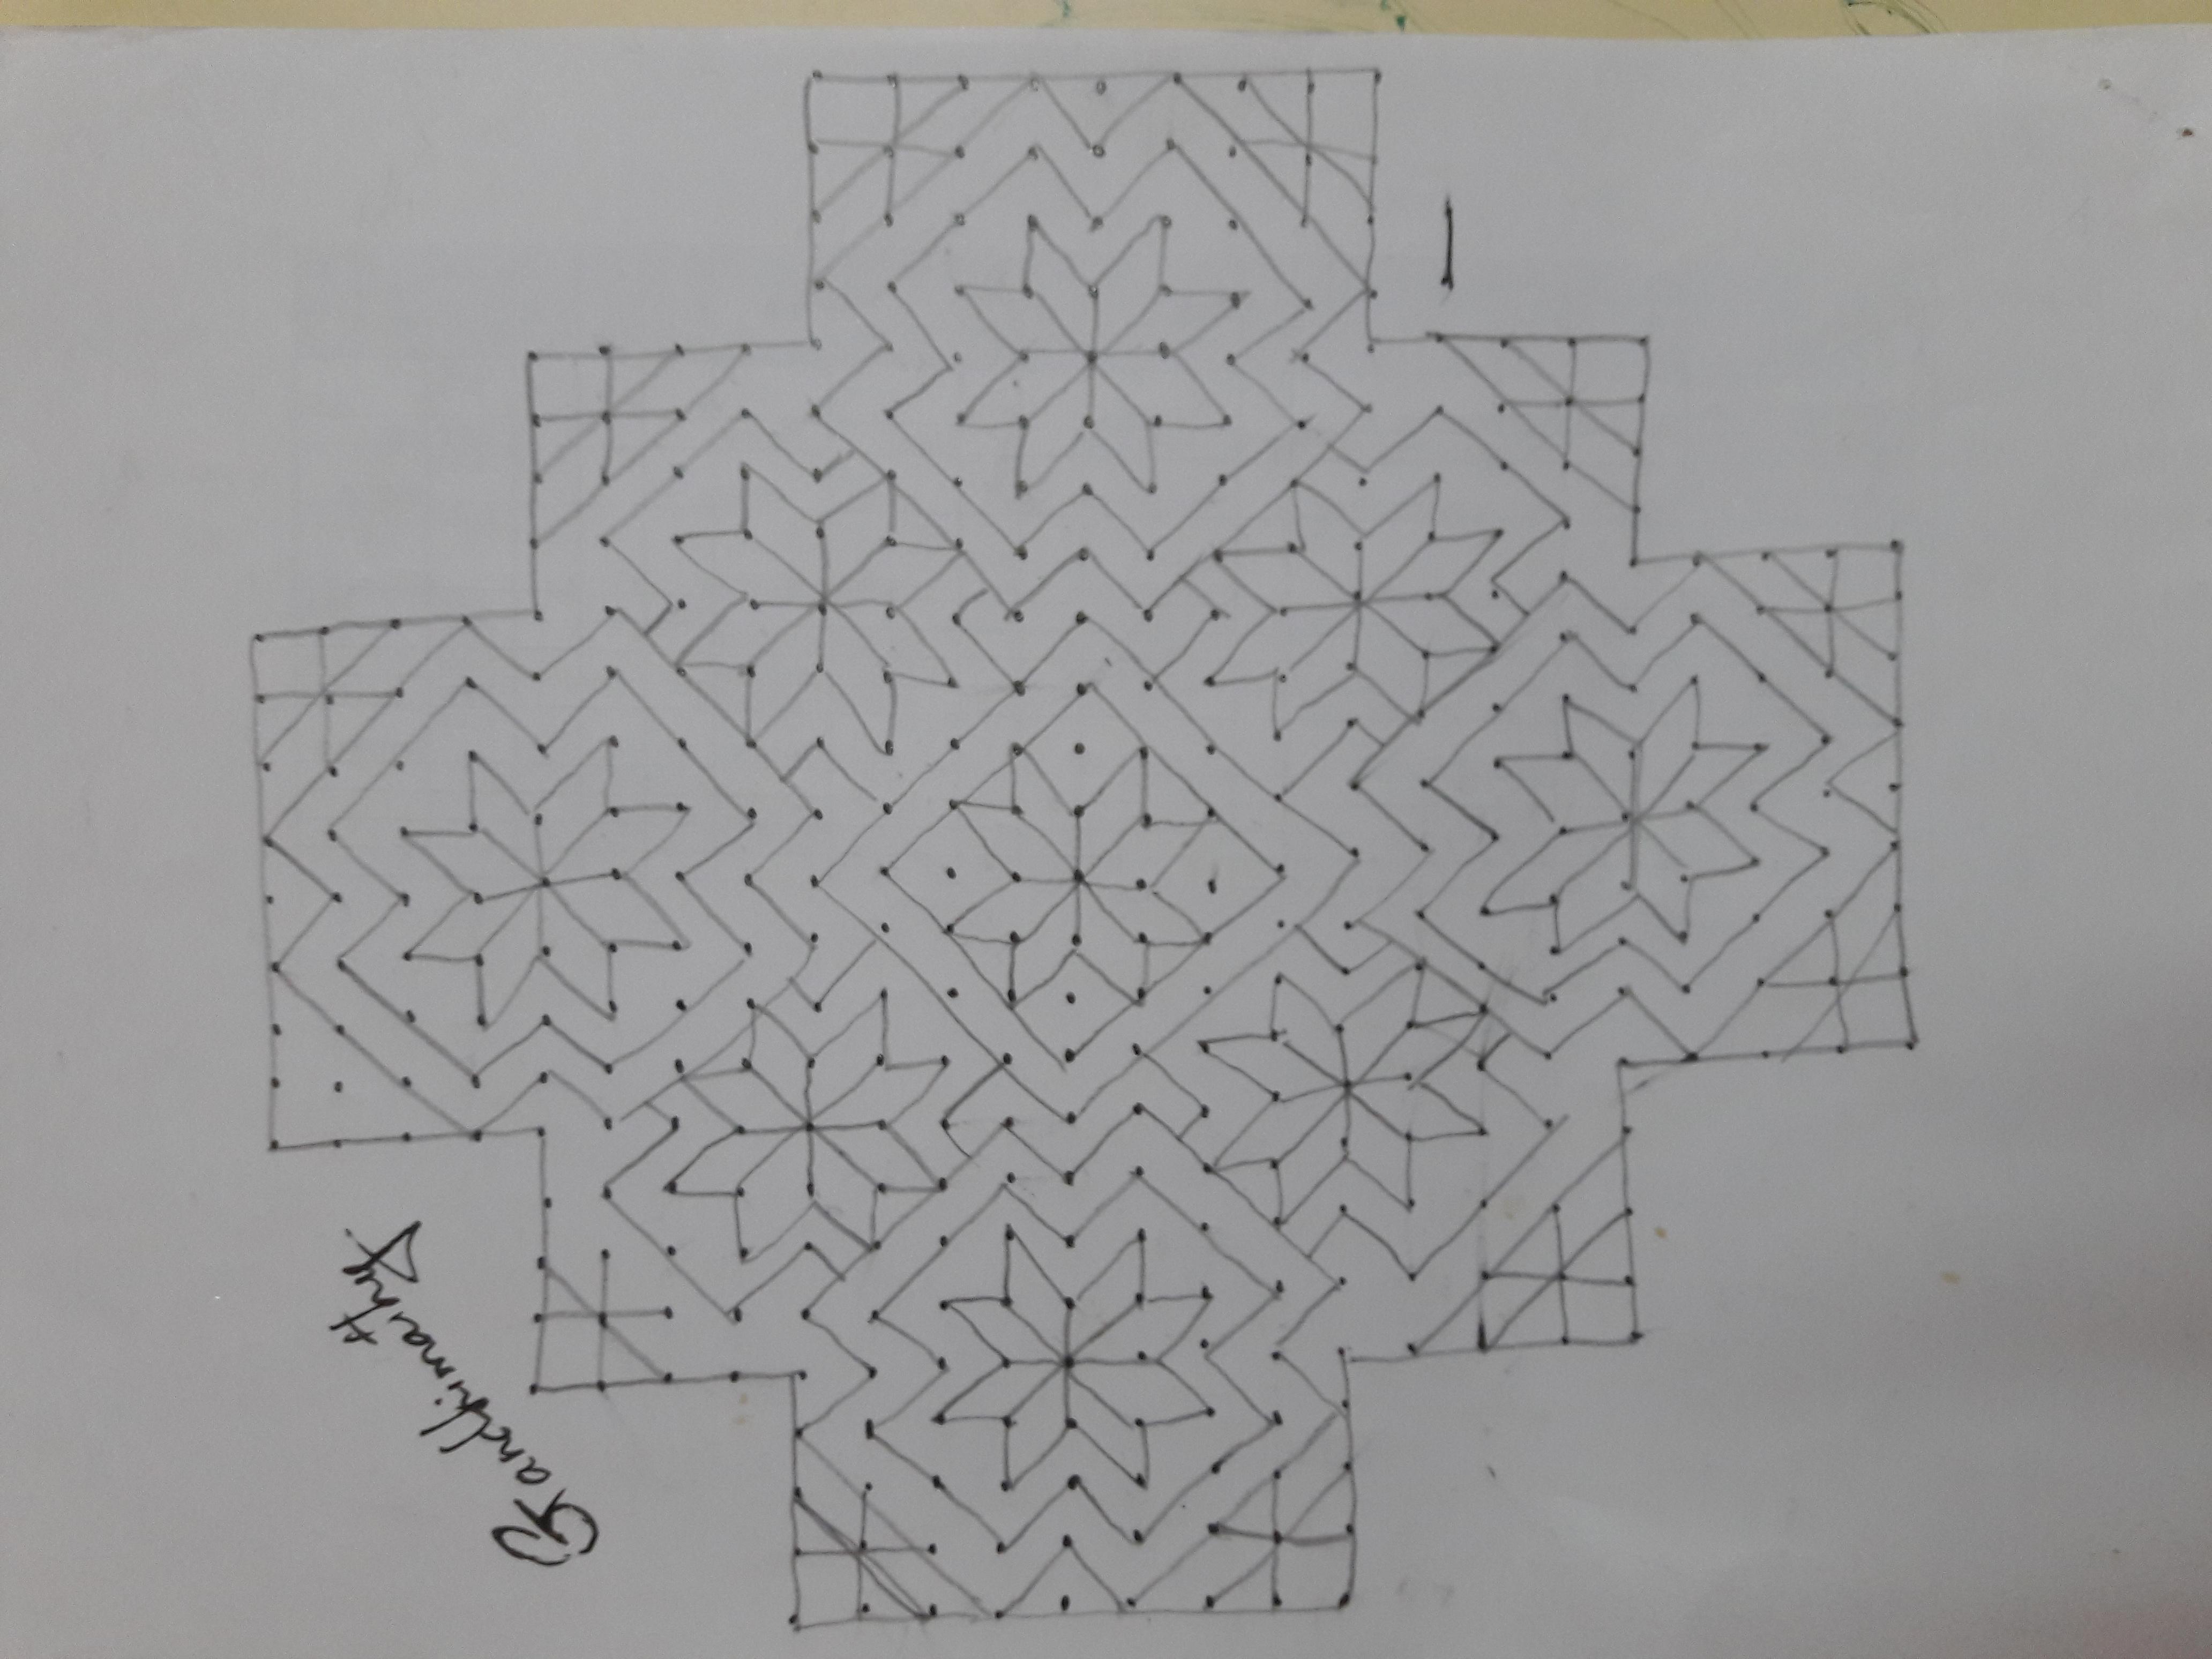 A lazy kolam || Contest Kolam with 25 dots